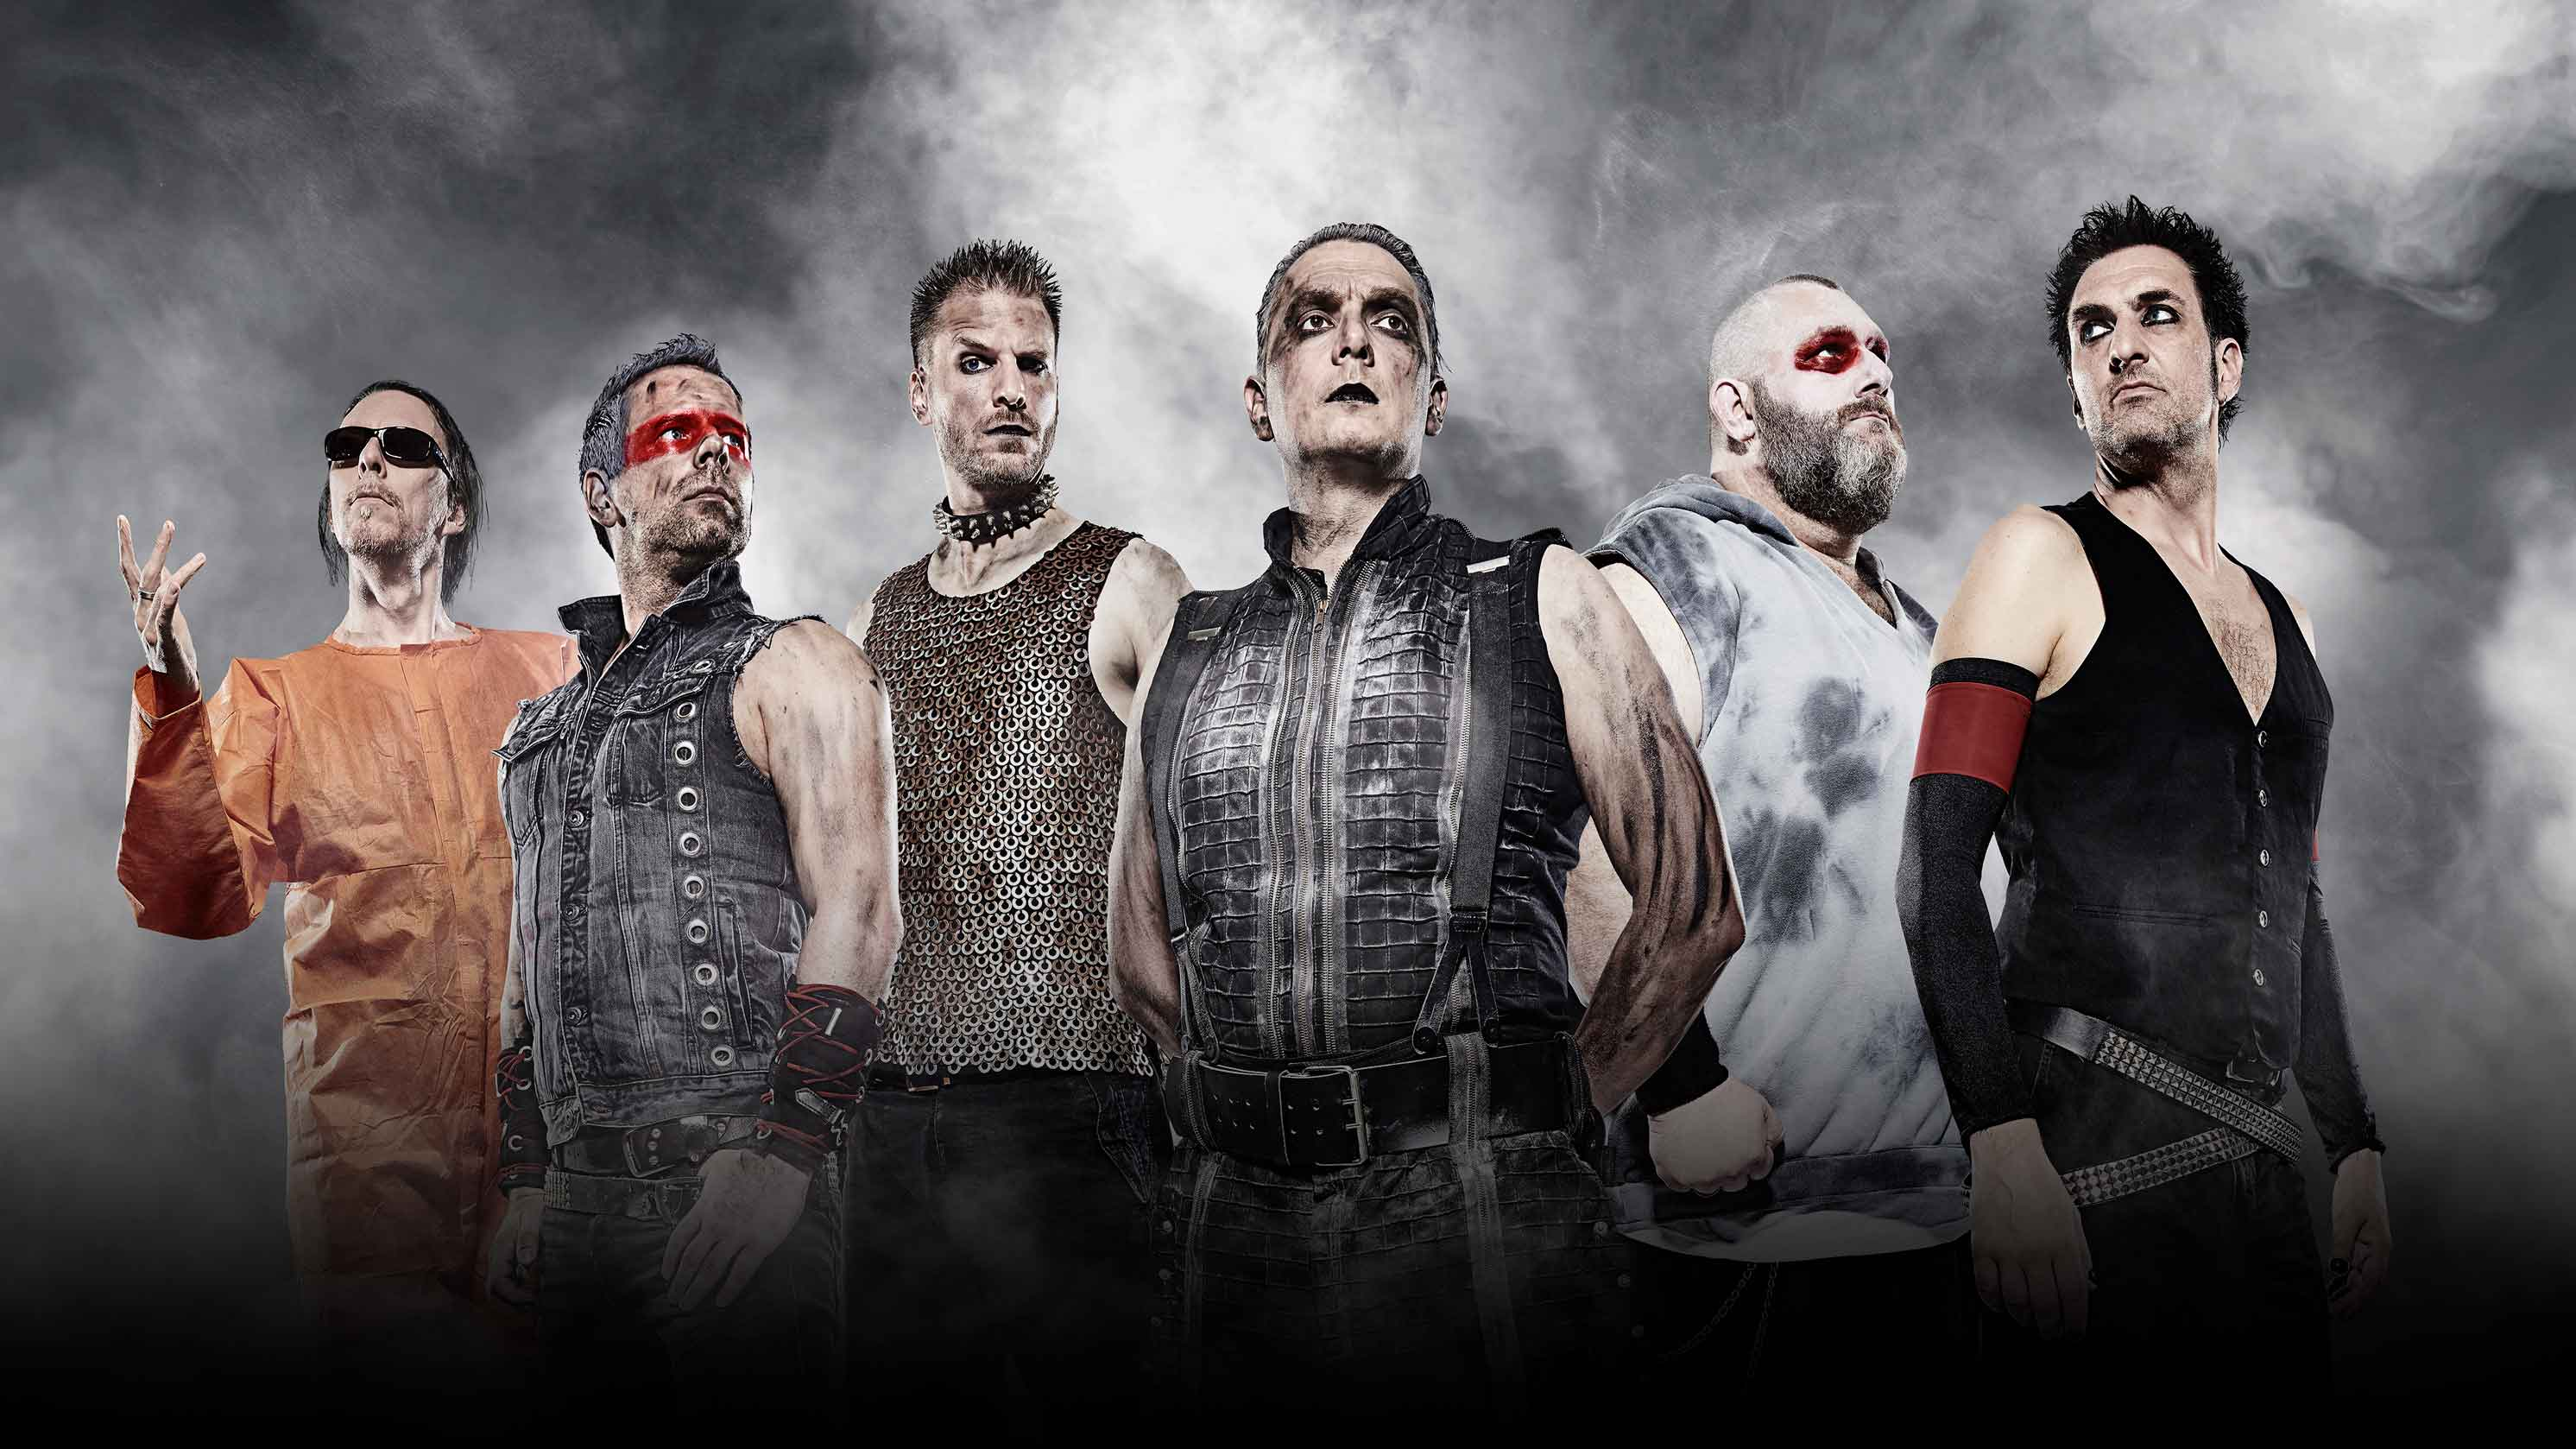 A Tribute to Rammstein, Feuerengel, MIWO-Events, MIWO-Eventpark Thüringen, Bad Berka, 14.09.2019, Motiv2